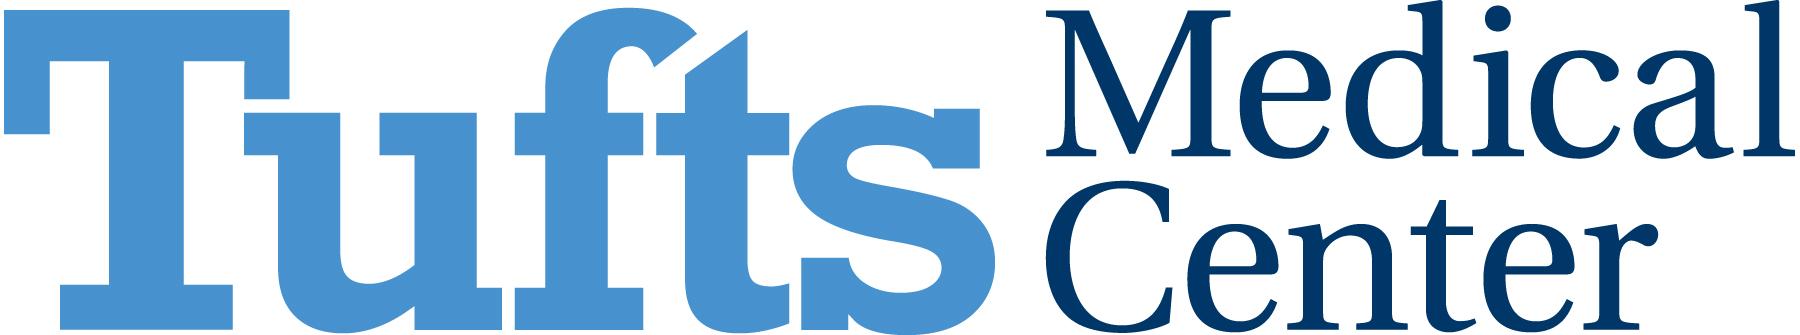 Tufts Medical Center logo